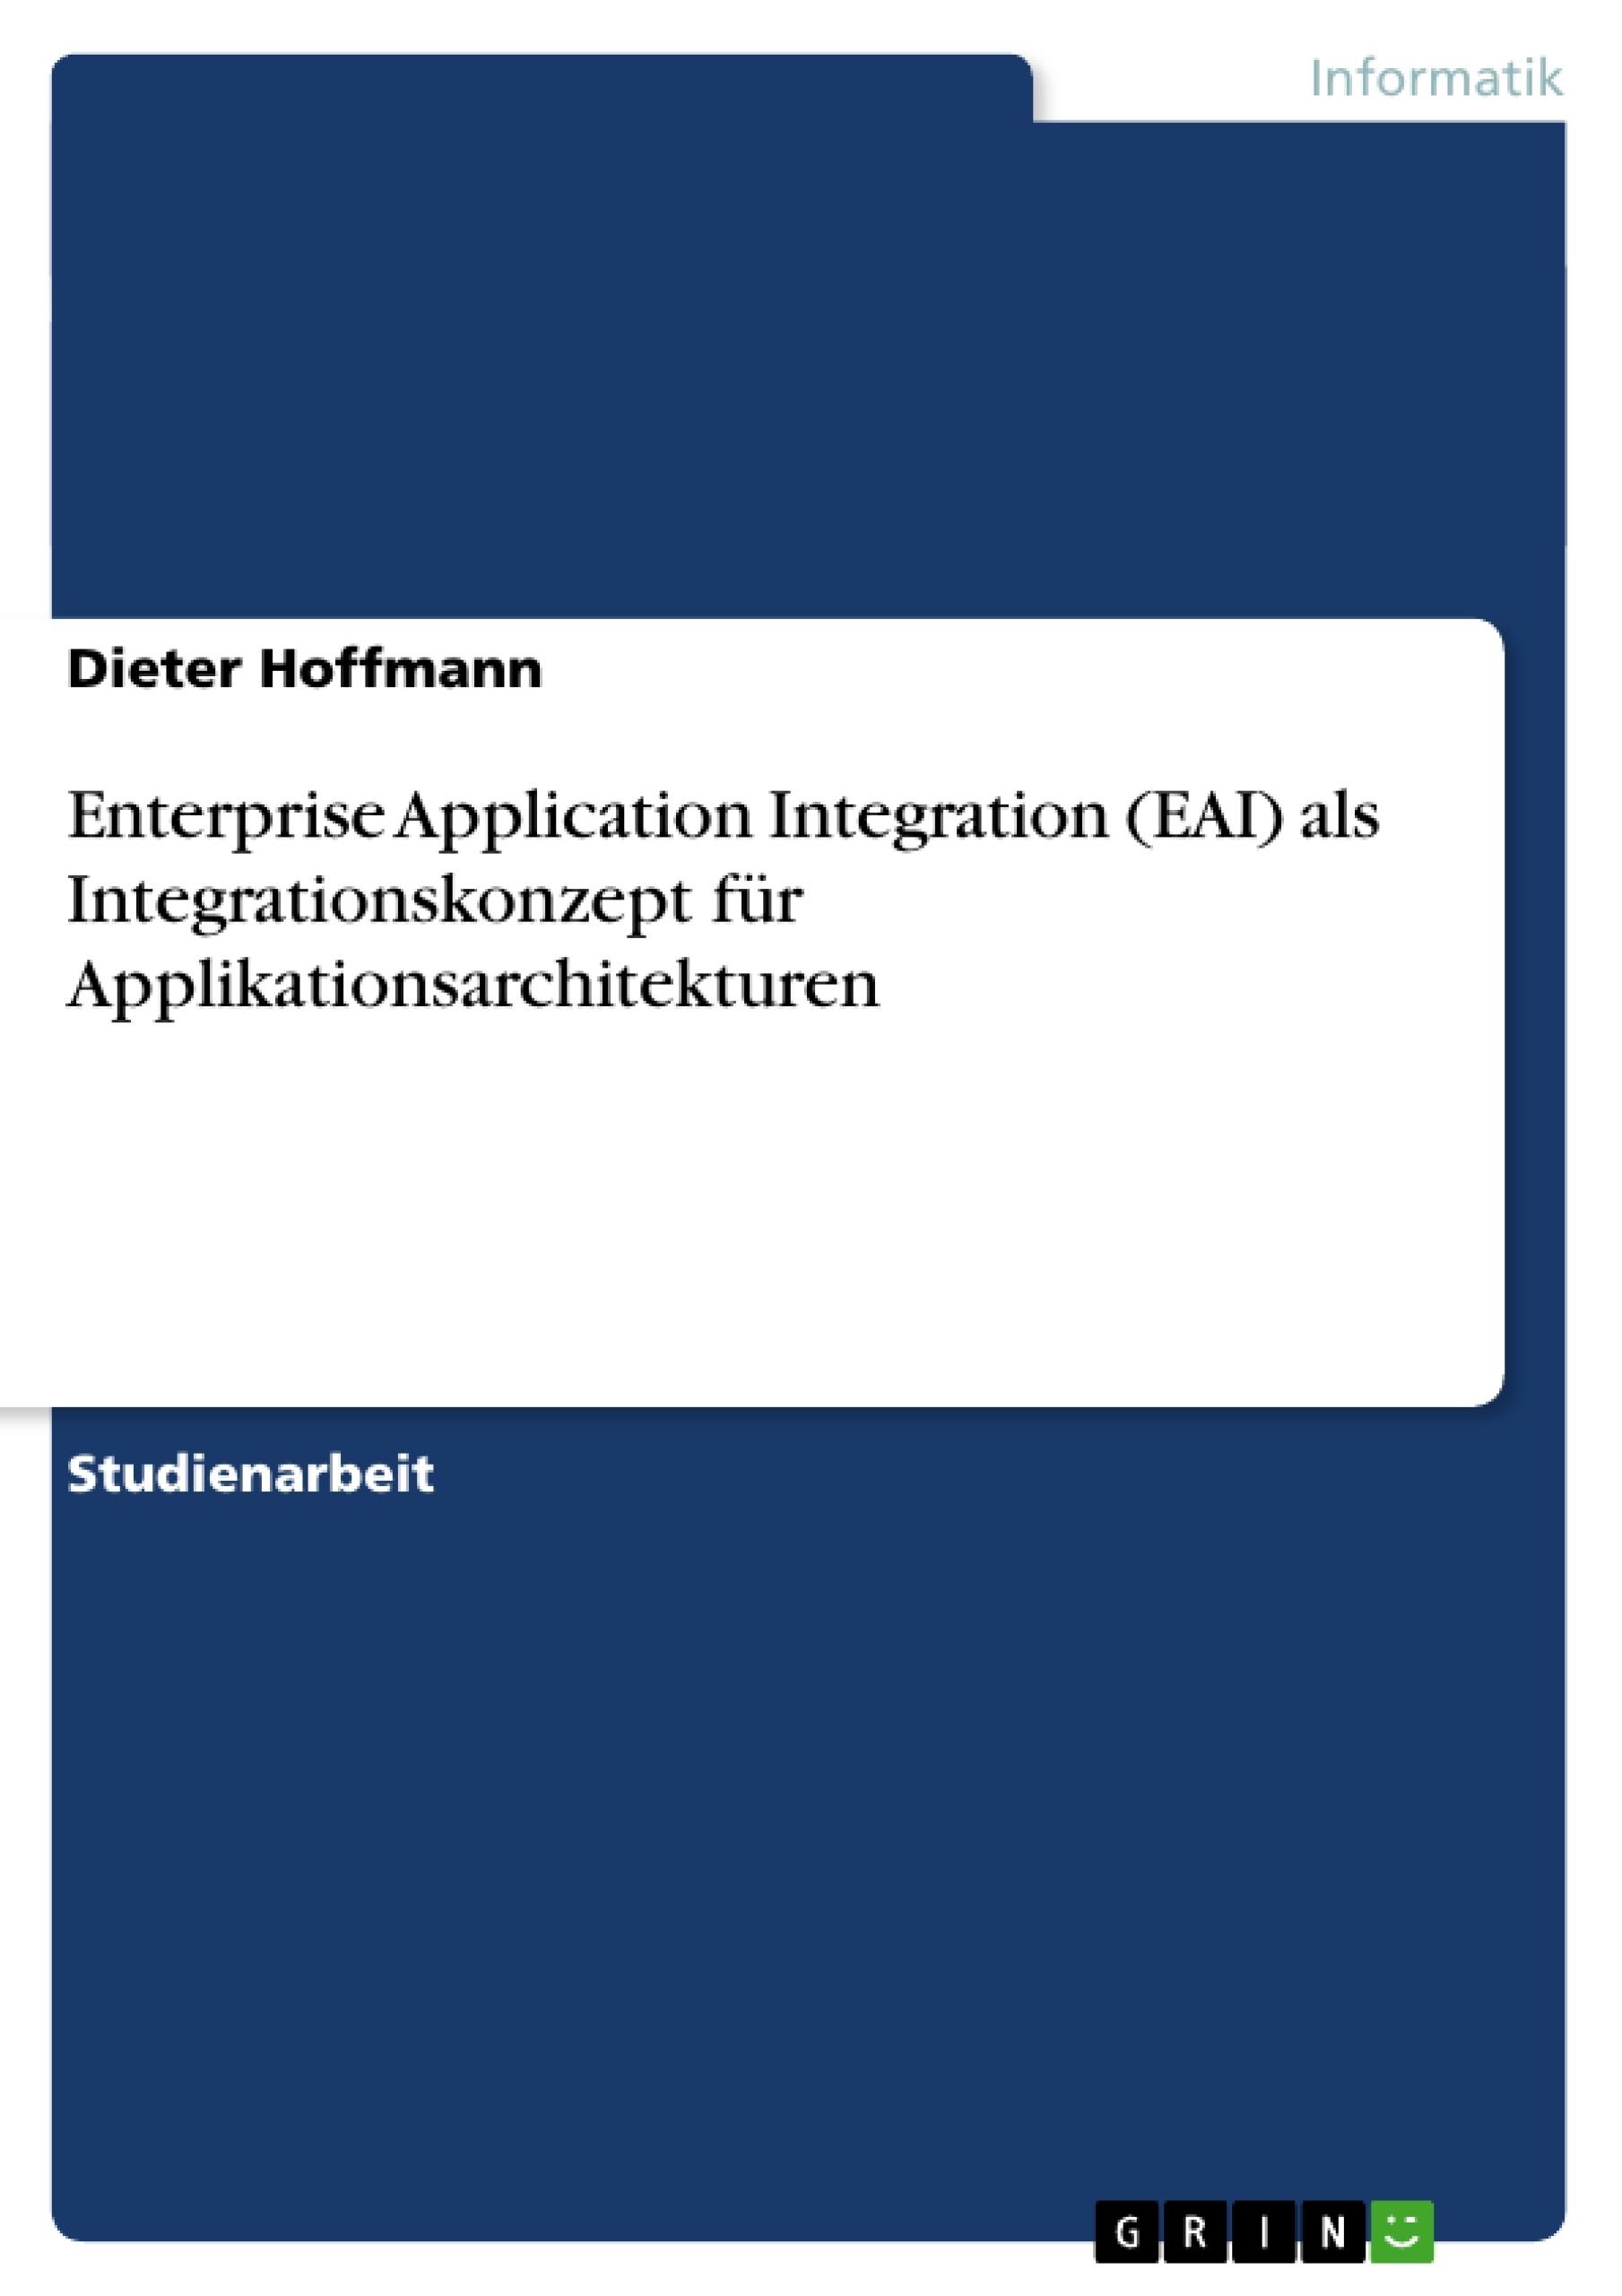 Titel: Enterprise Application Integration (EAI) als Integrationskonzept für Applikationsarchitekturen